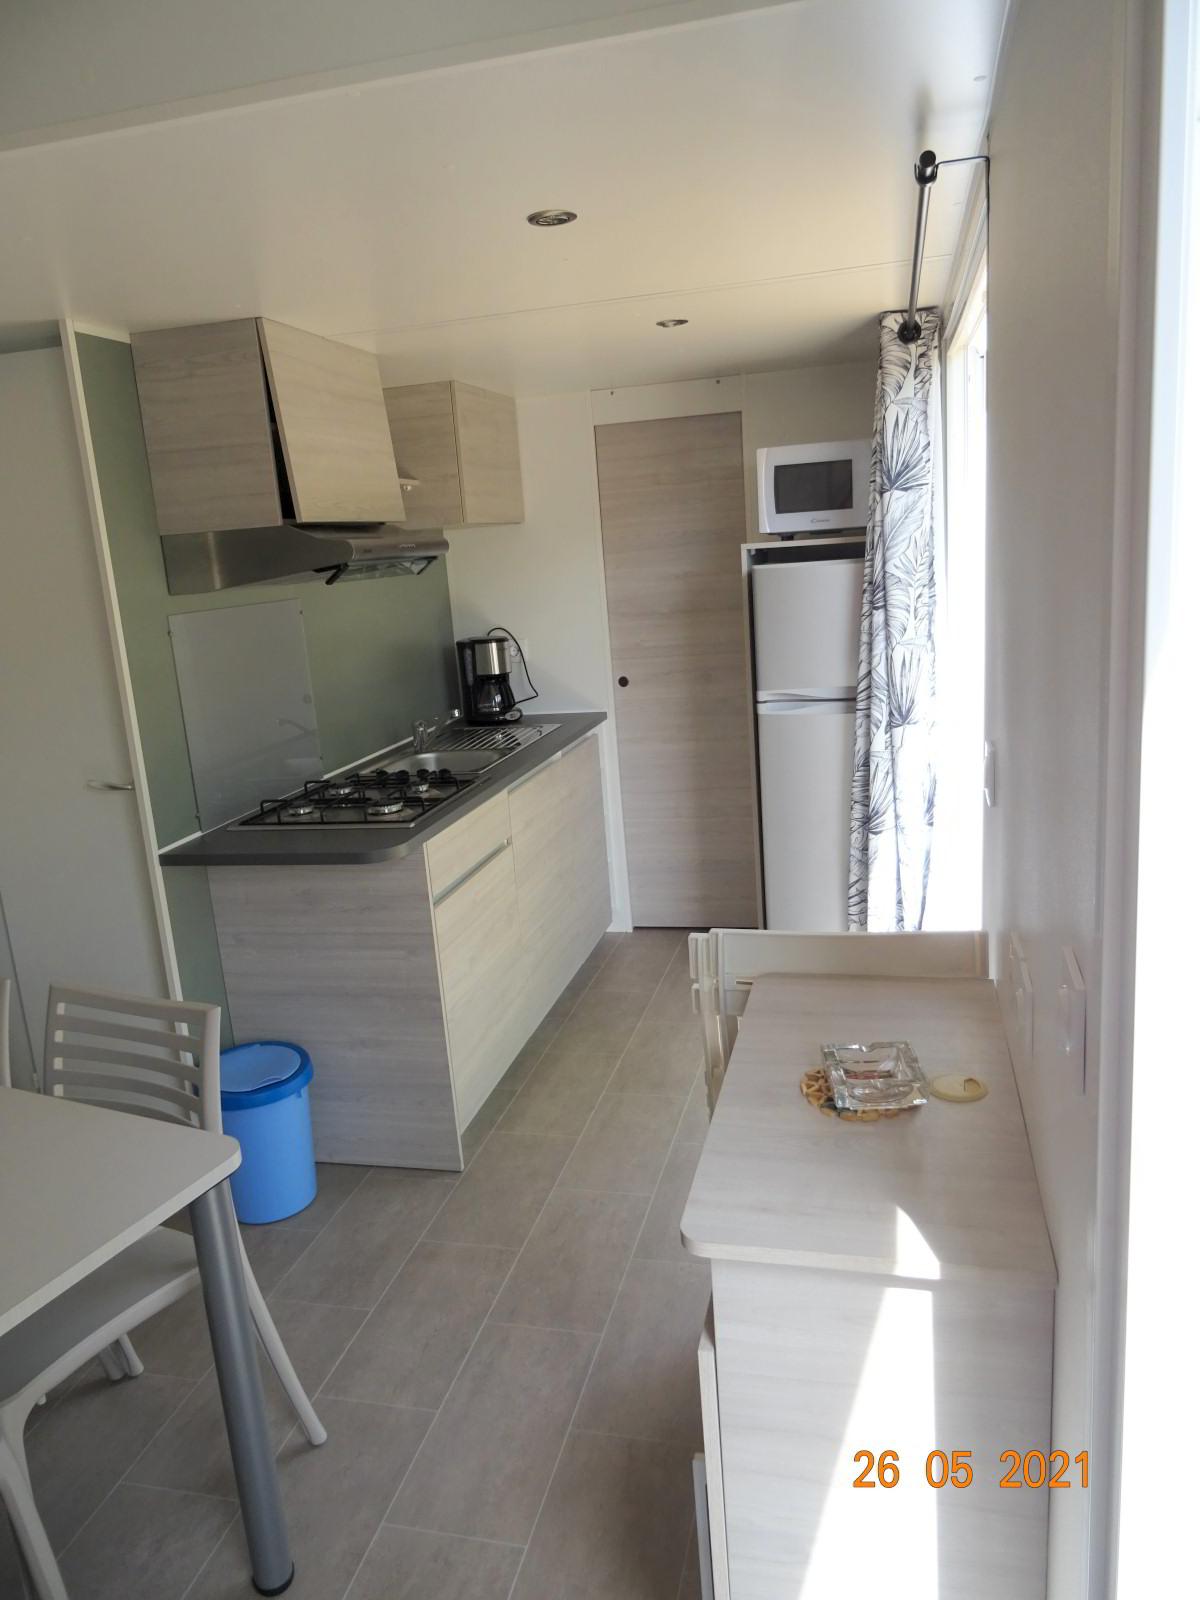 Keukenhoek, nieuwe stacaravan met 2 slaapkamers